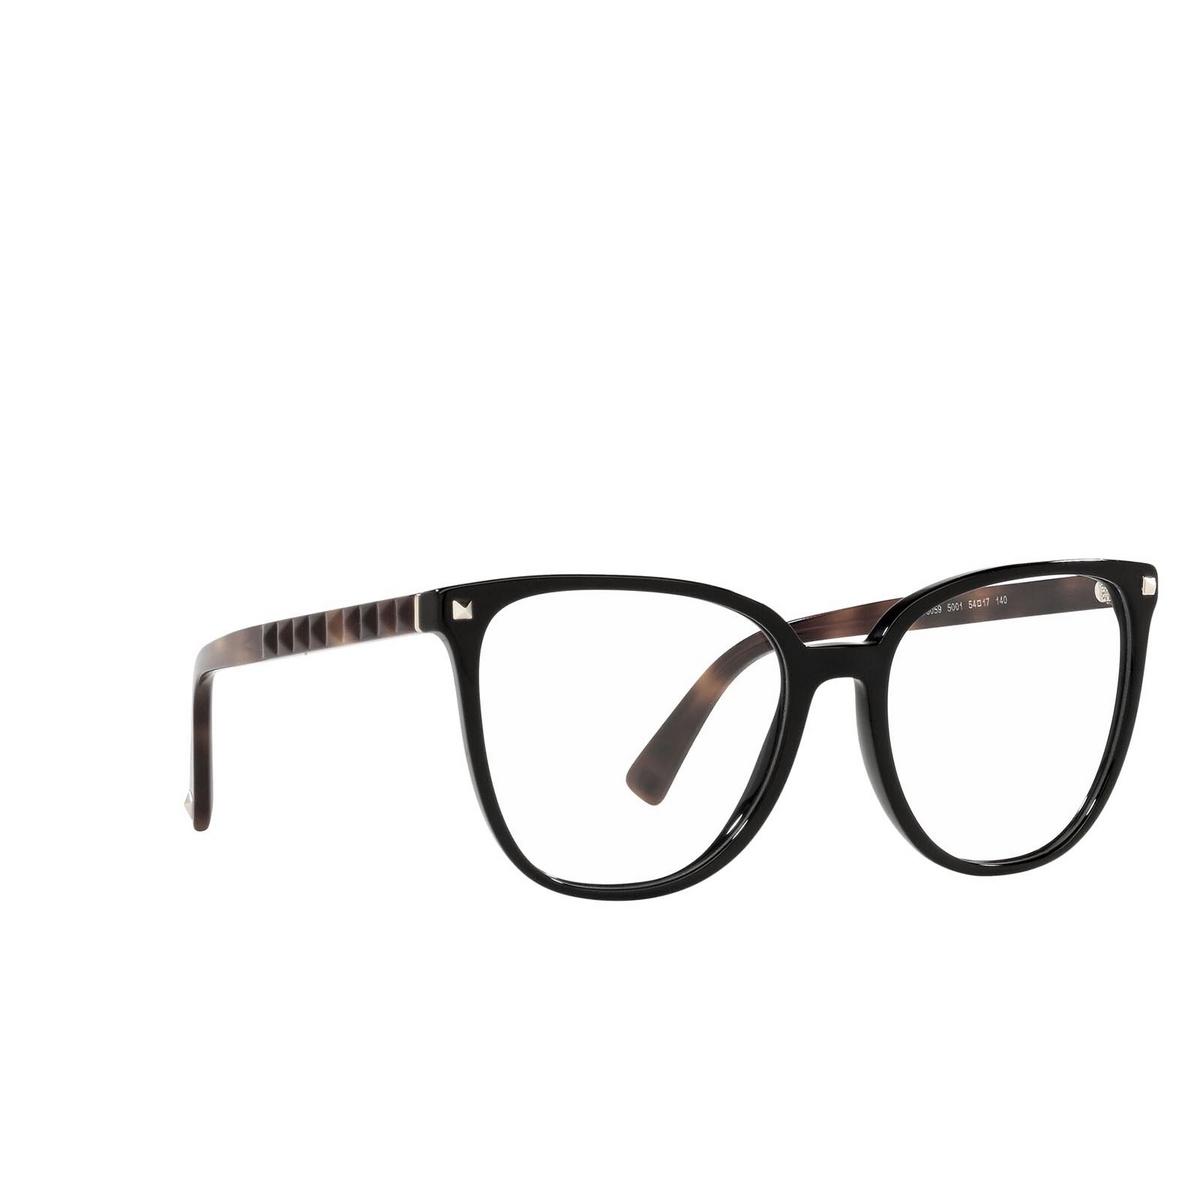 Valentino® Square Eyeglasses: VA3059 color Black 5001 - three-quarters view.